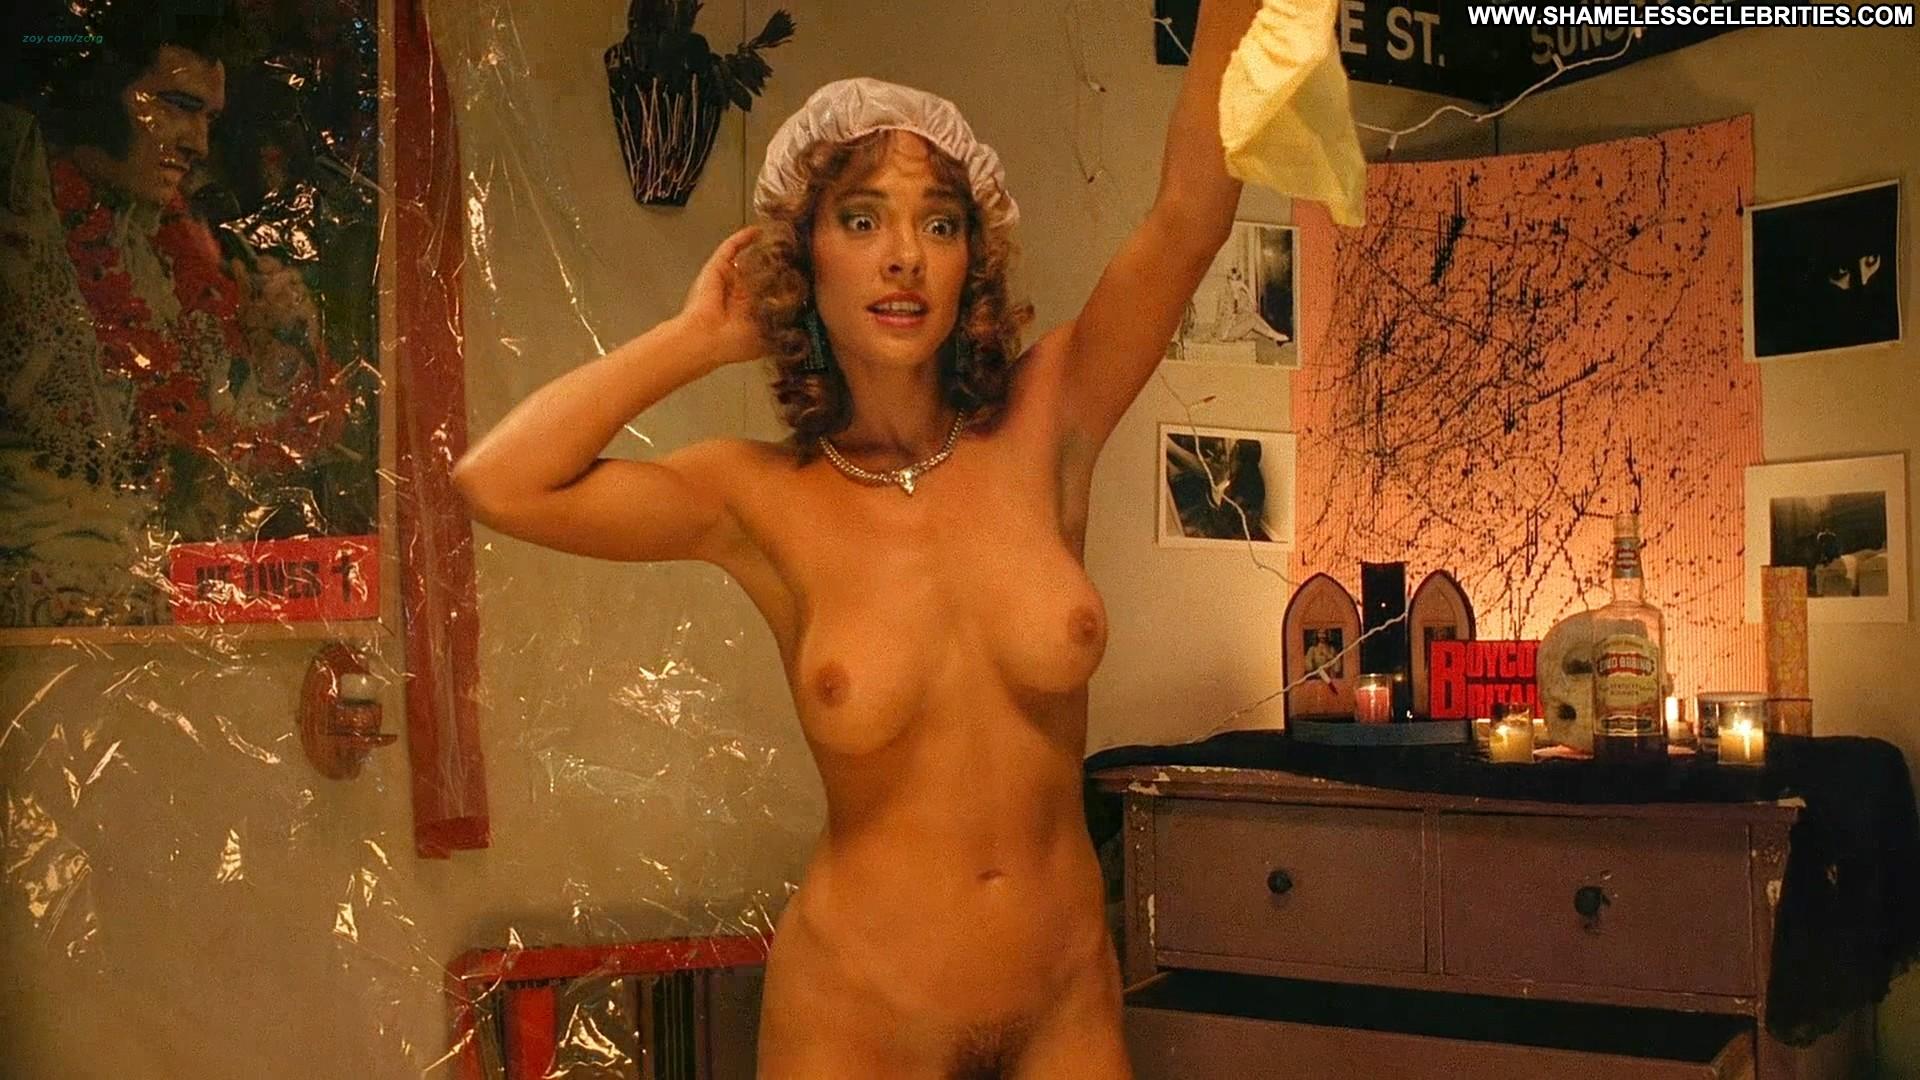 Posed who female nude celebrities